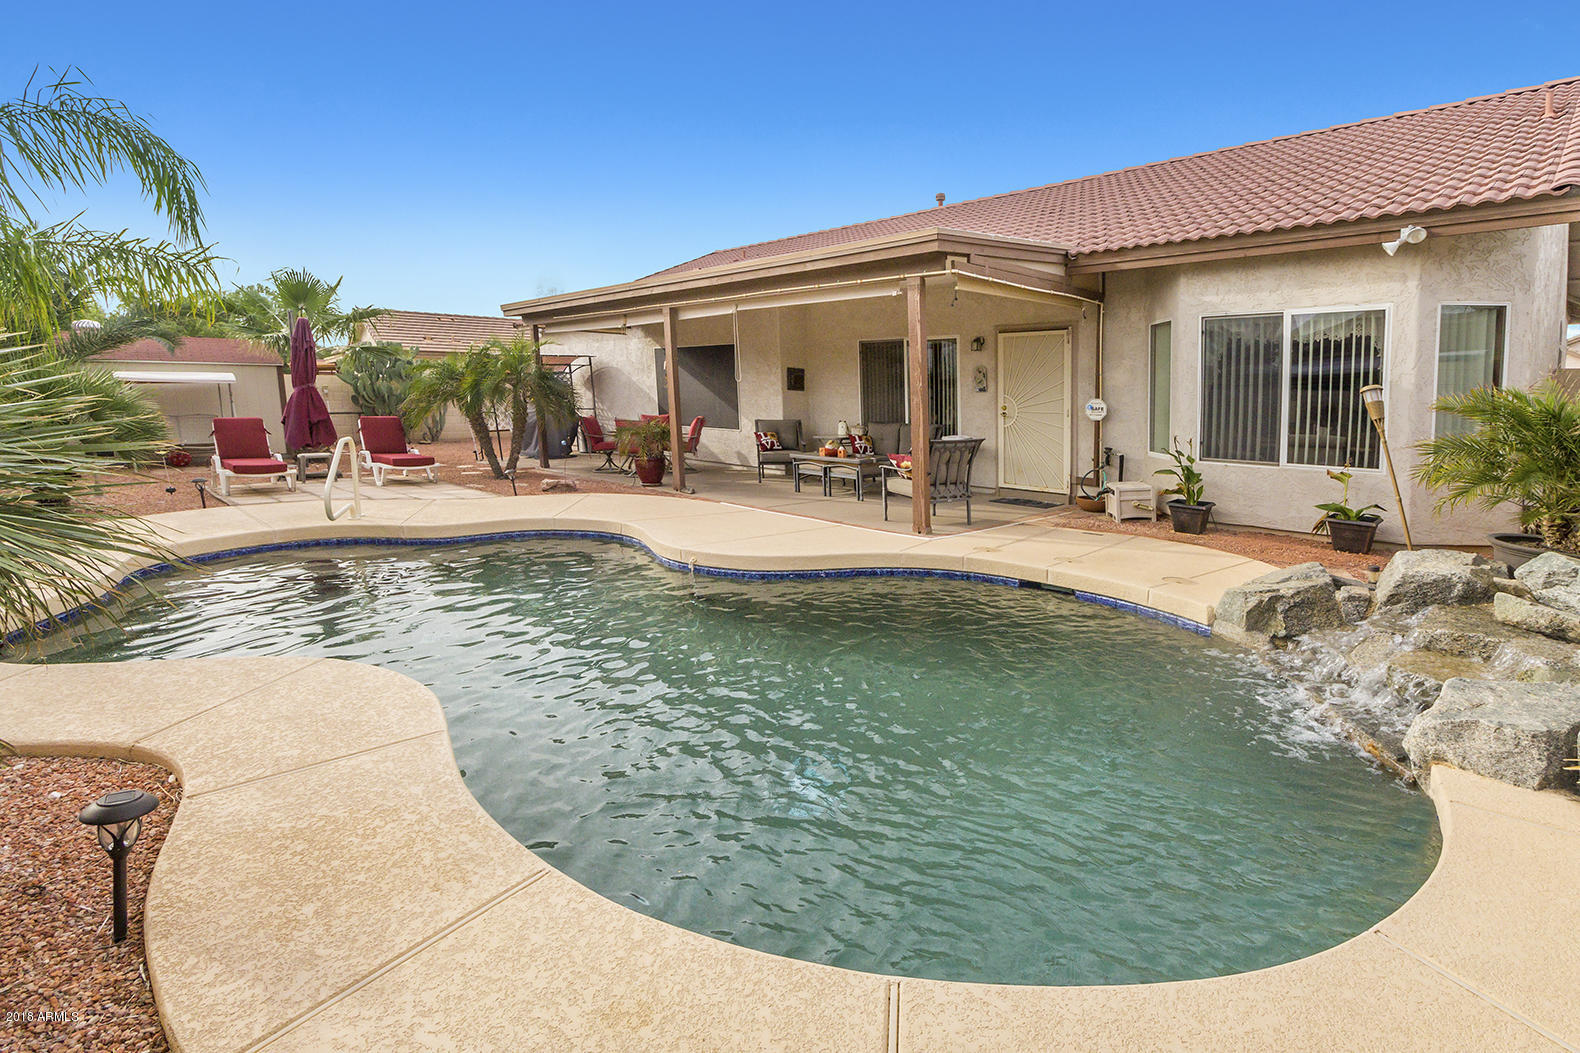 Photo for 441 E Dartmouth Drive, Casa Grande, AZ 85122 (MLS # 5851938)